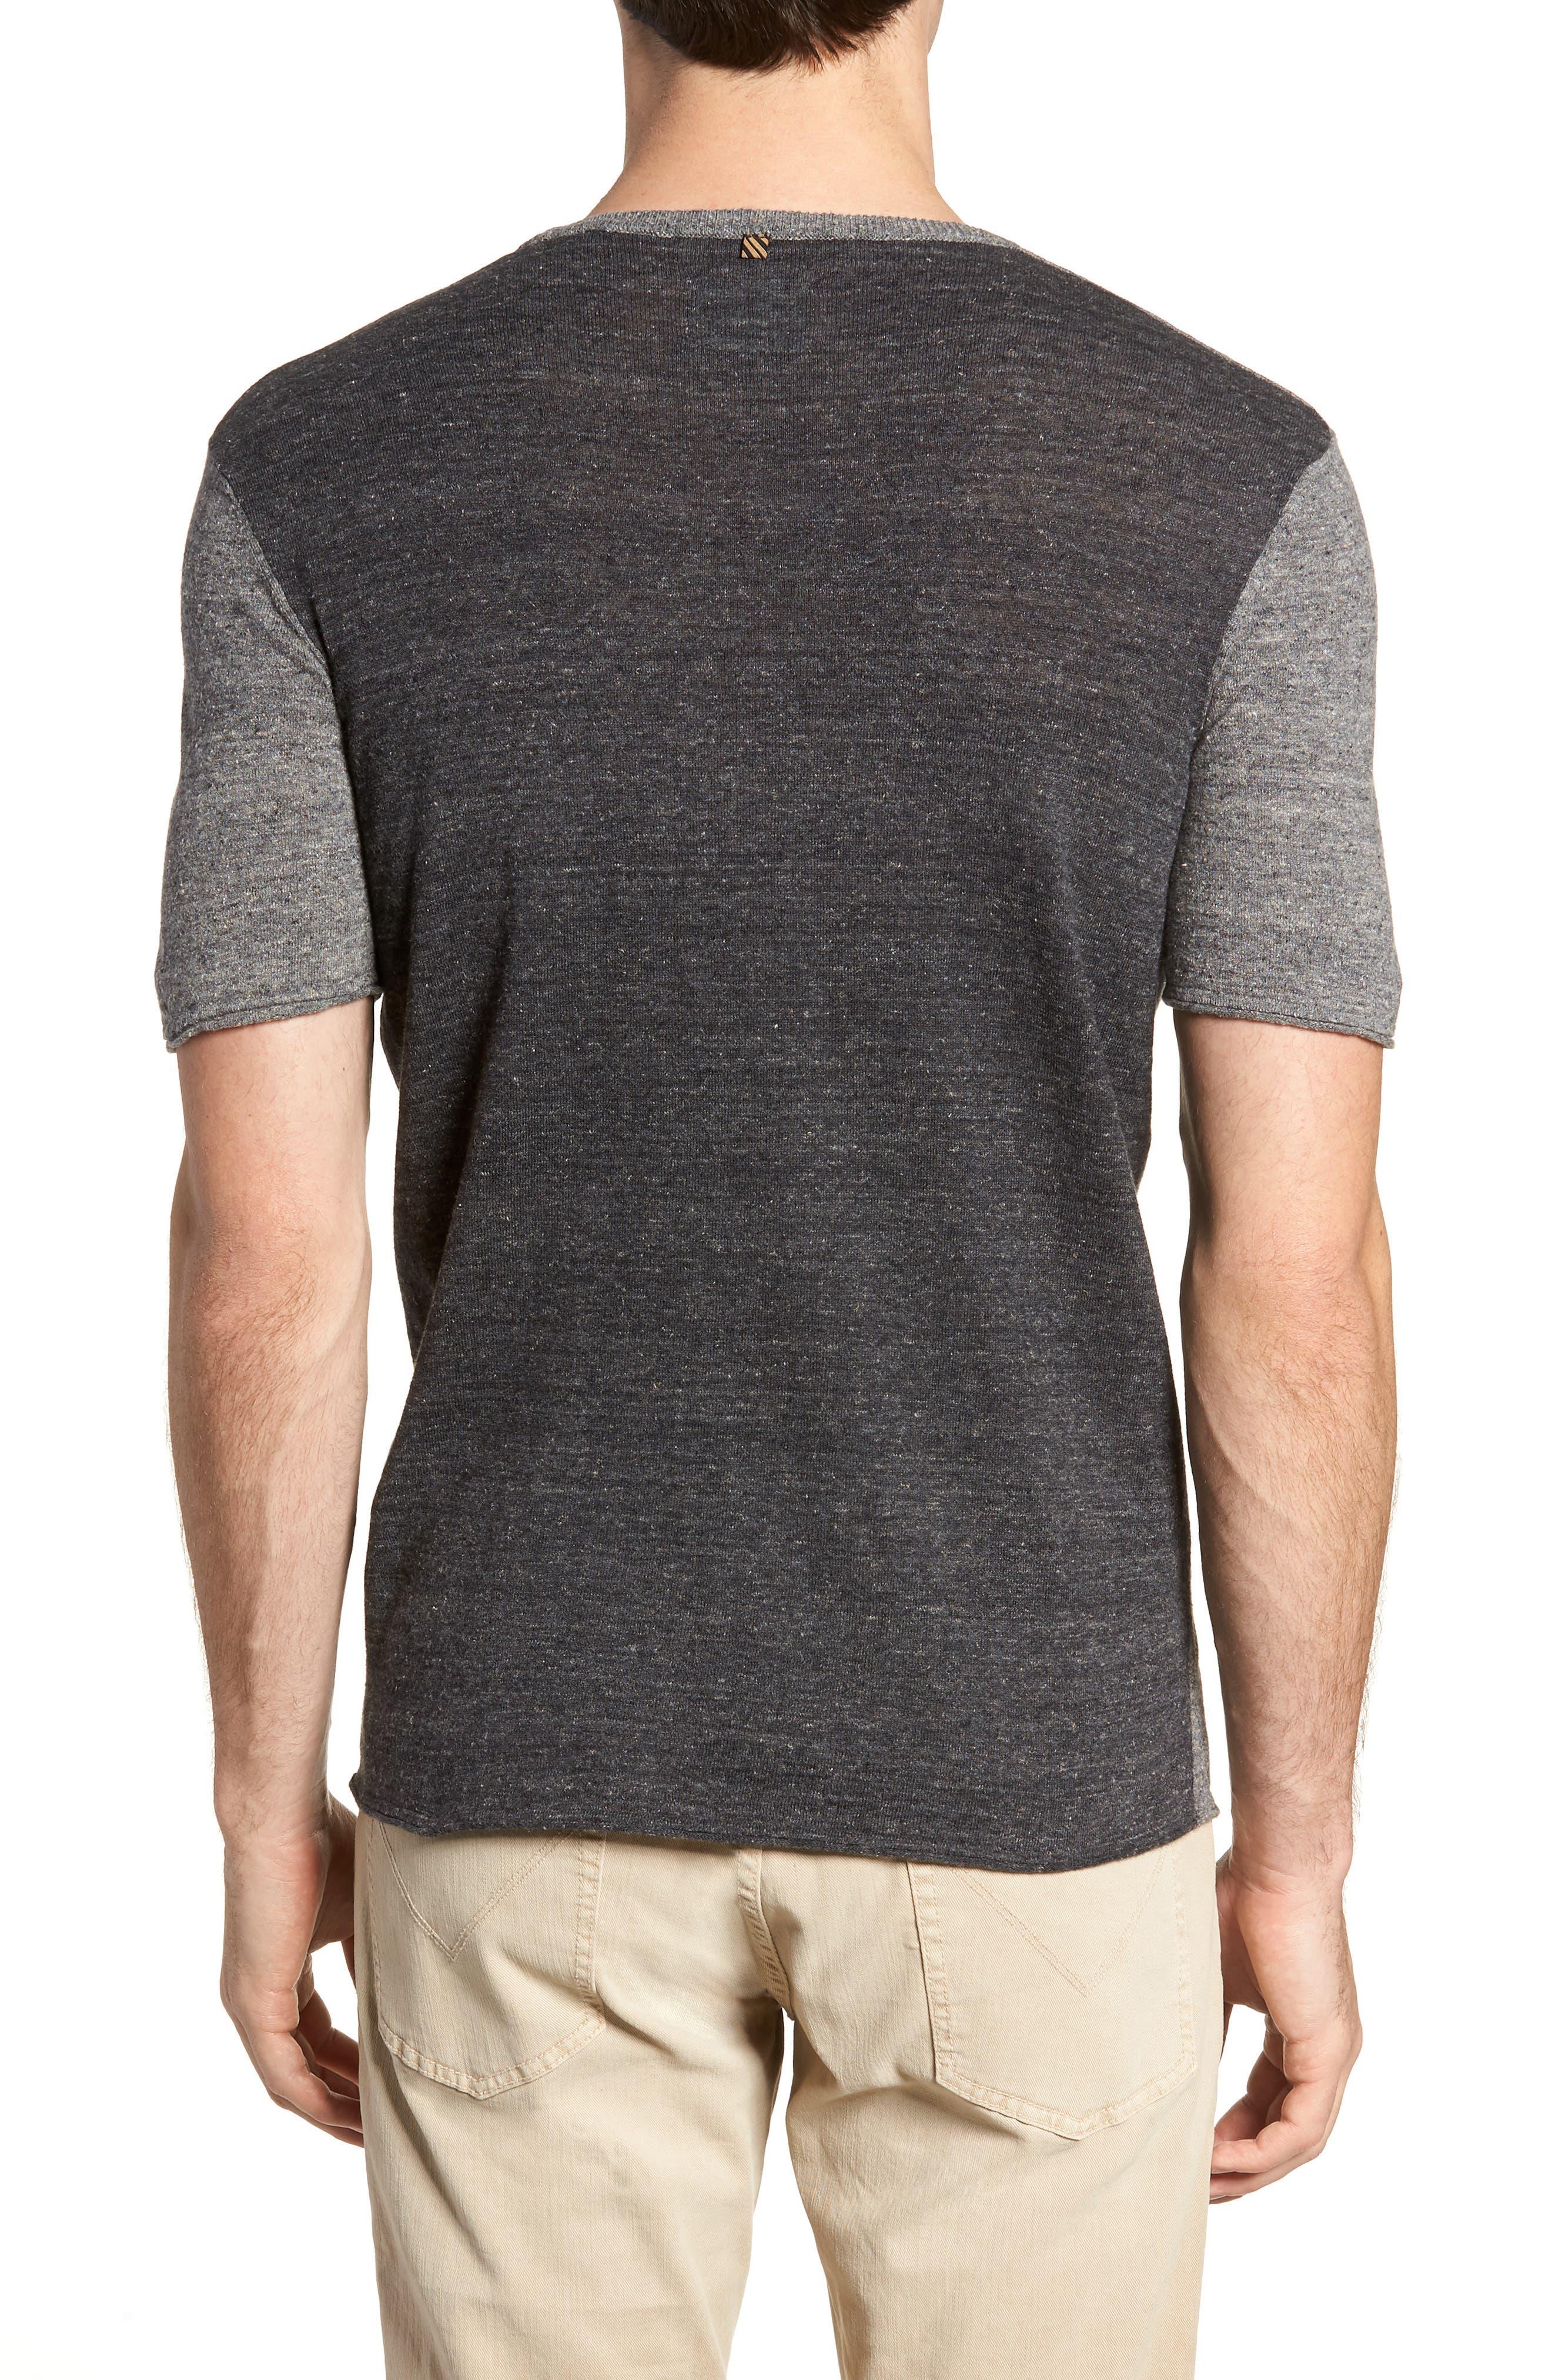 Two-Tone Crewneck T-Shirt,                             Alternate thumbnail 2, color,                             060